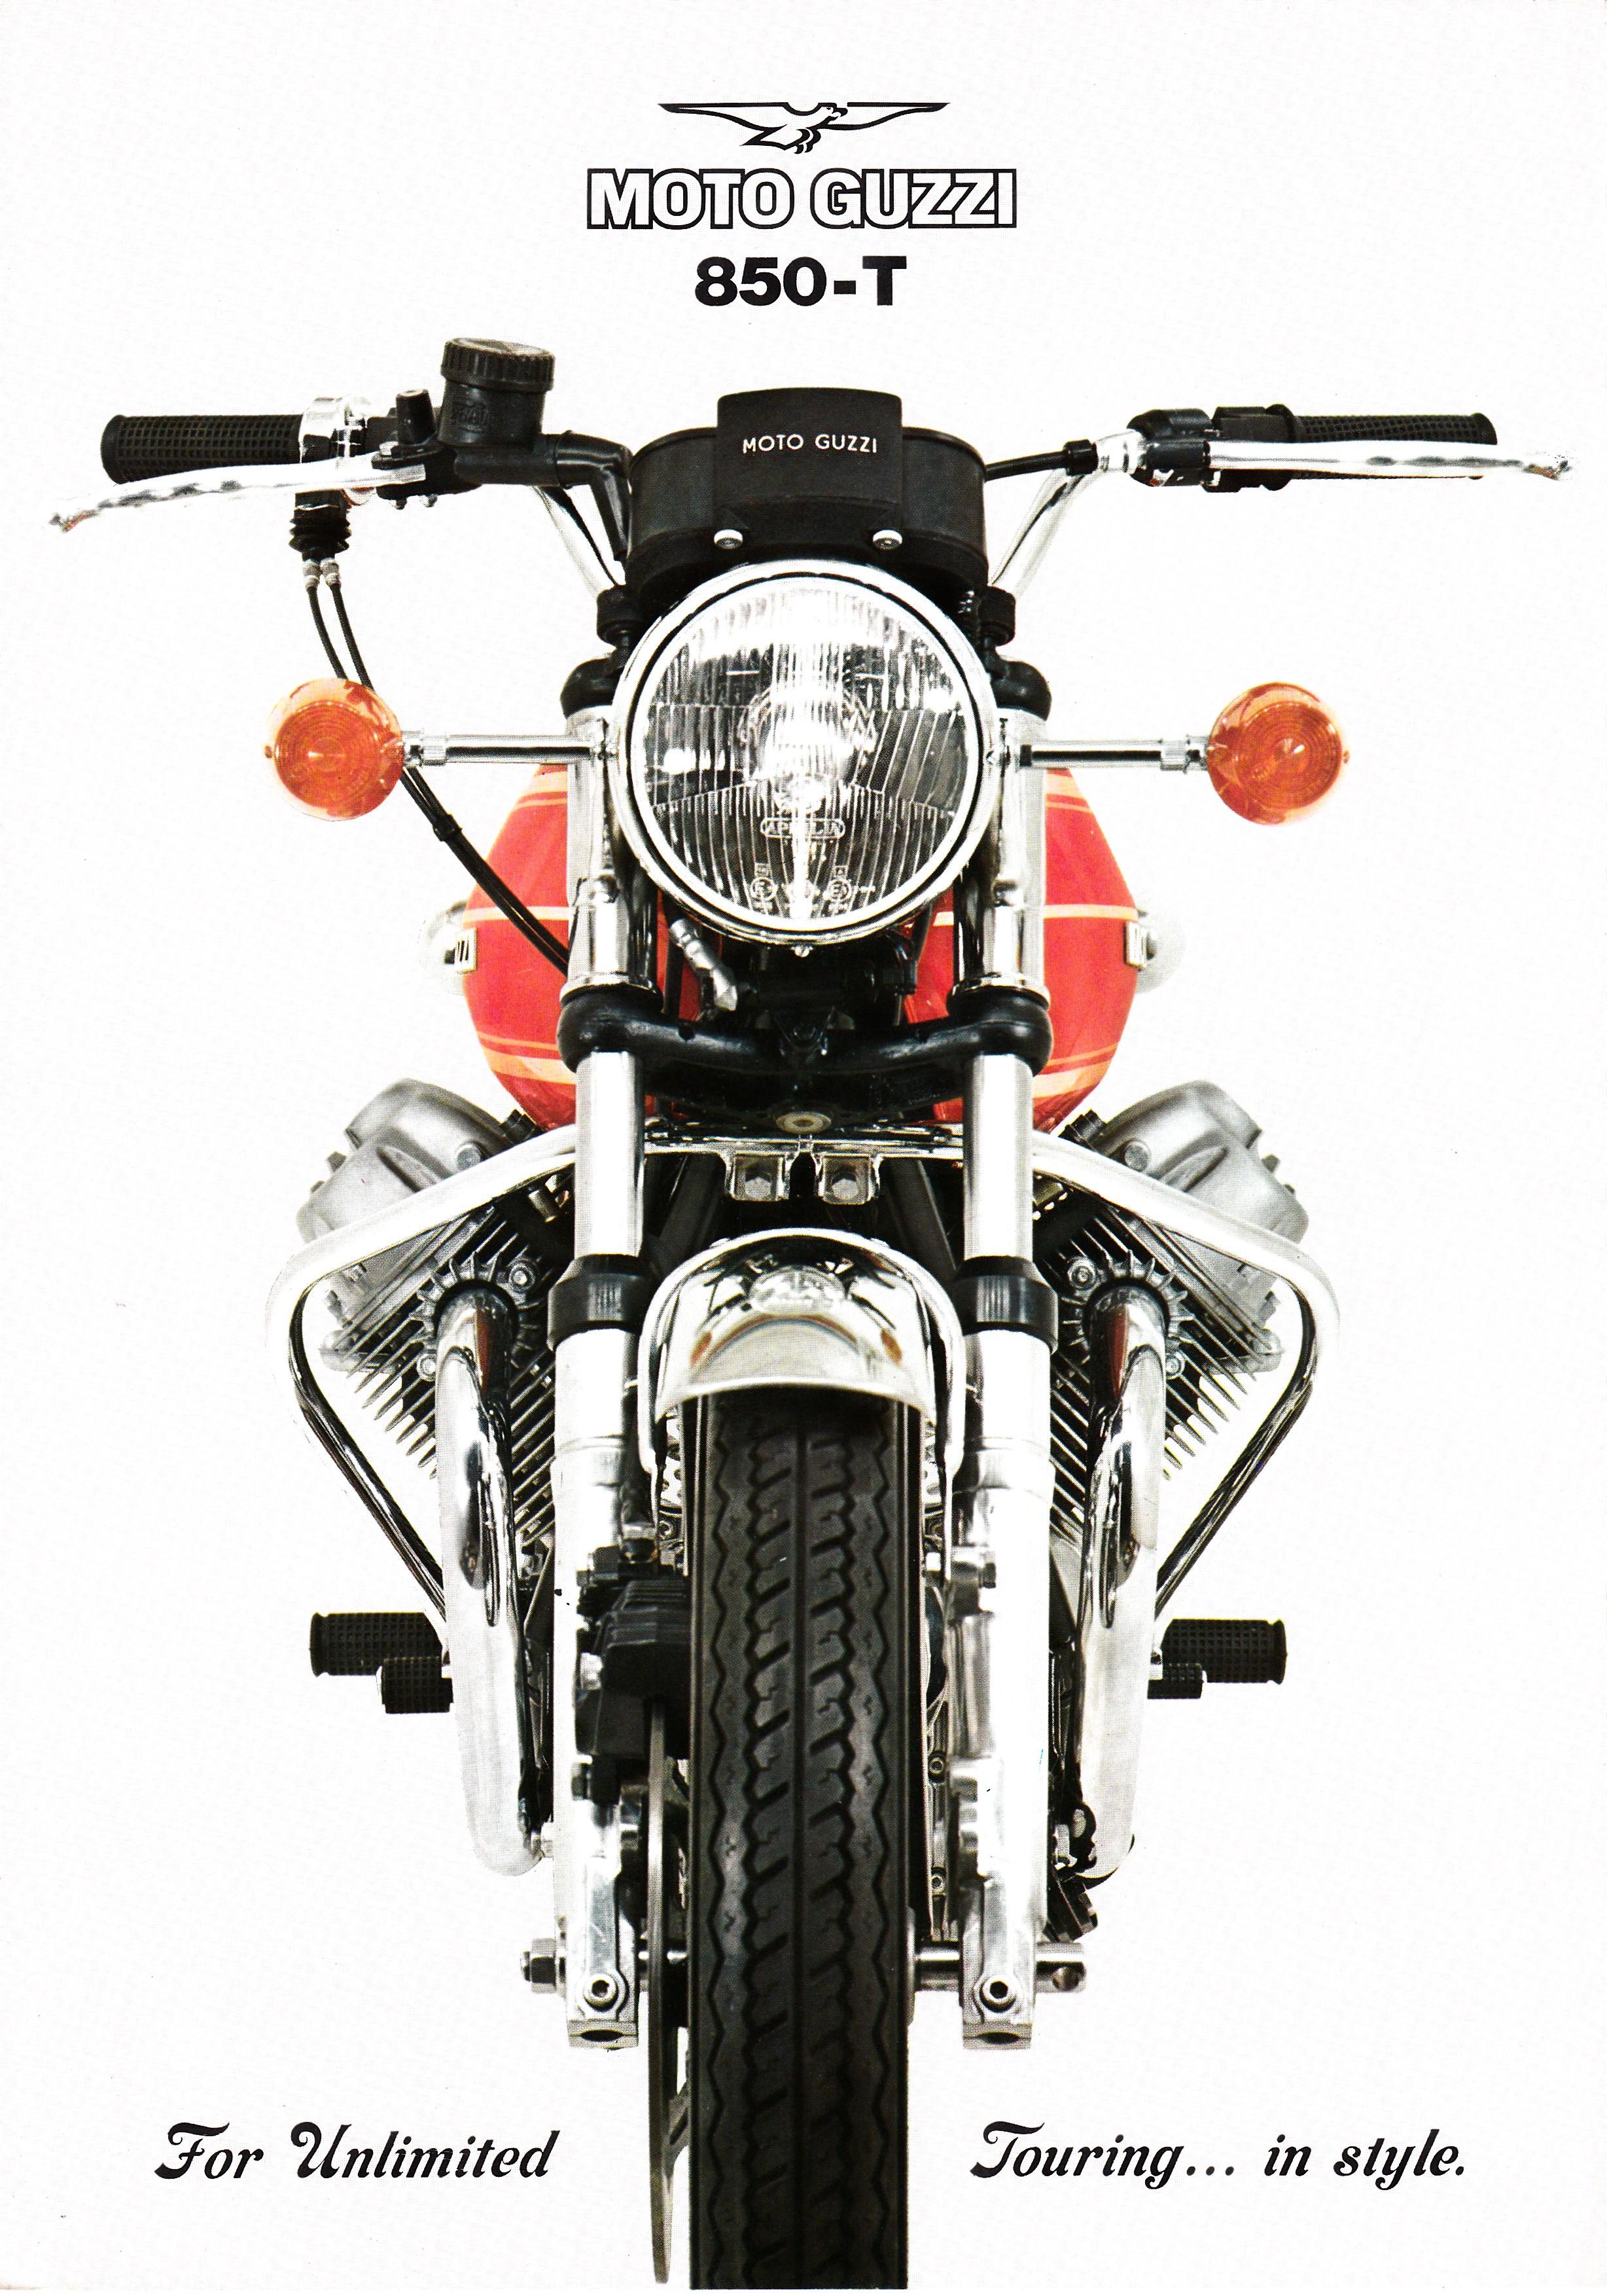 brochure - moto guzzi 850 t - more moto guzzi topics - moto guzzi - topics